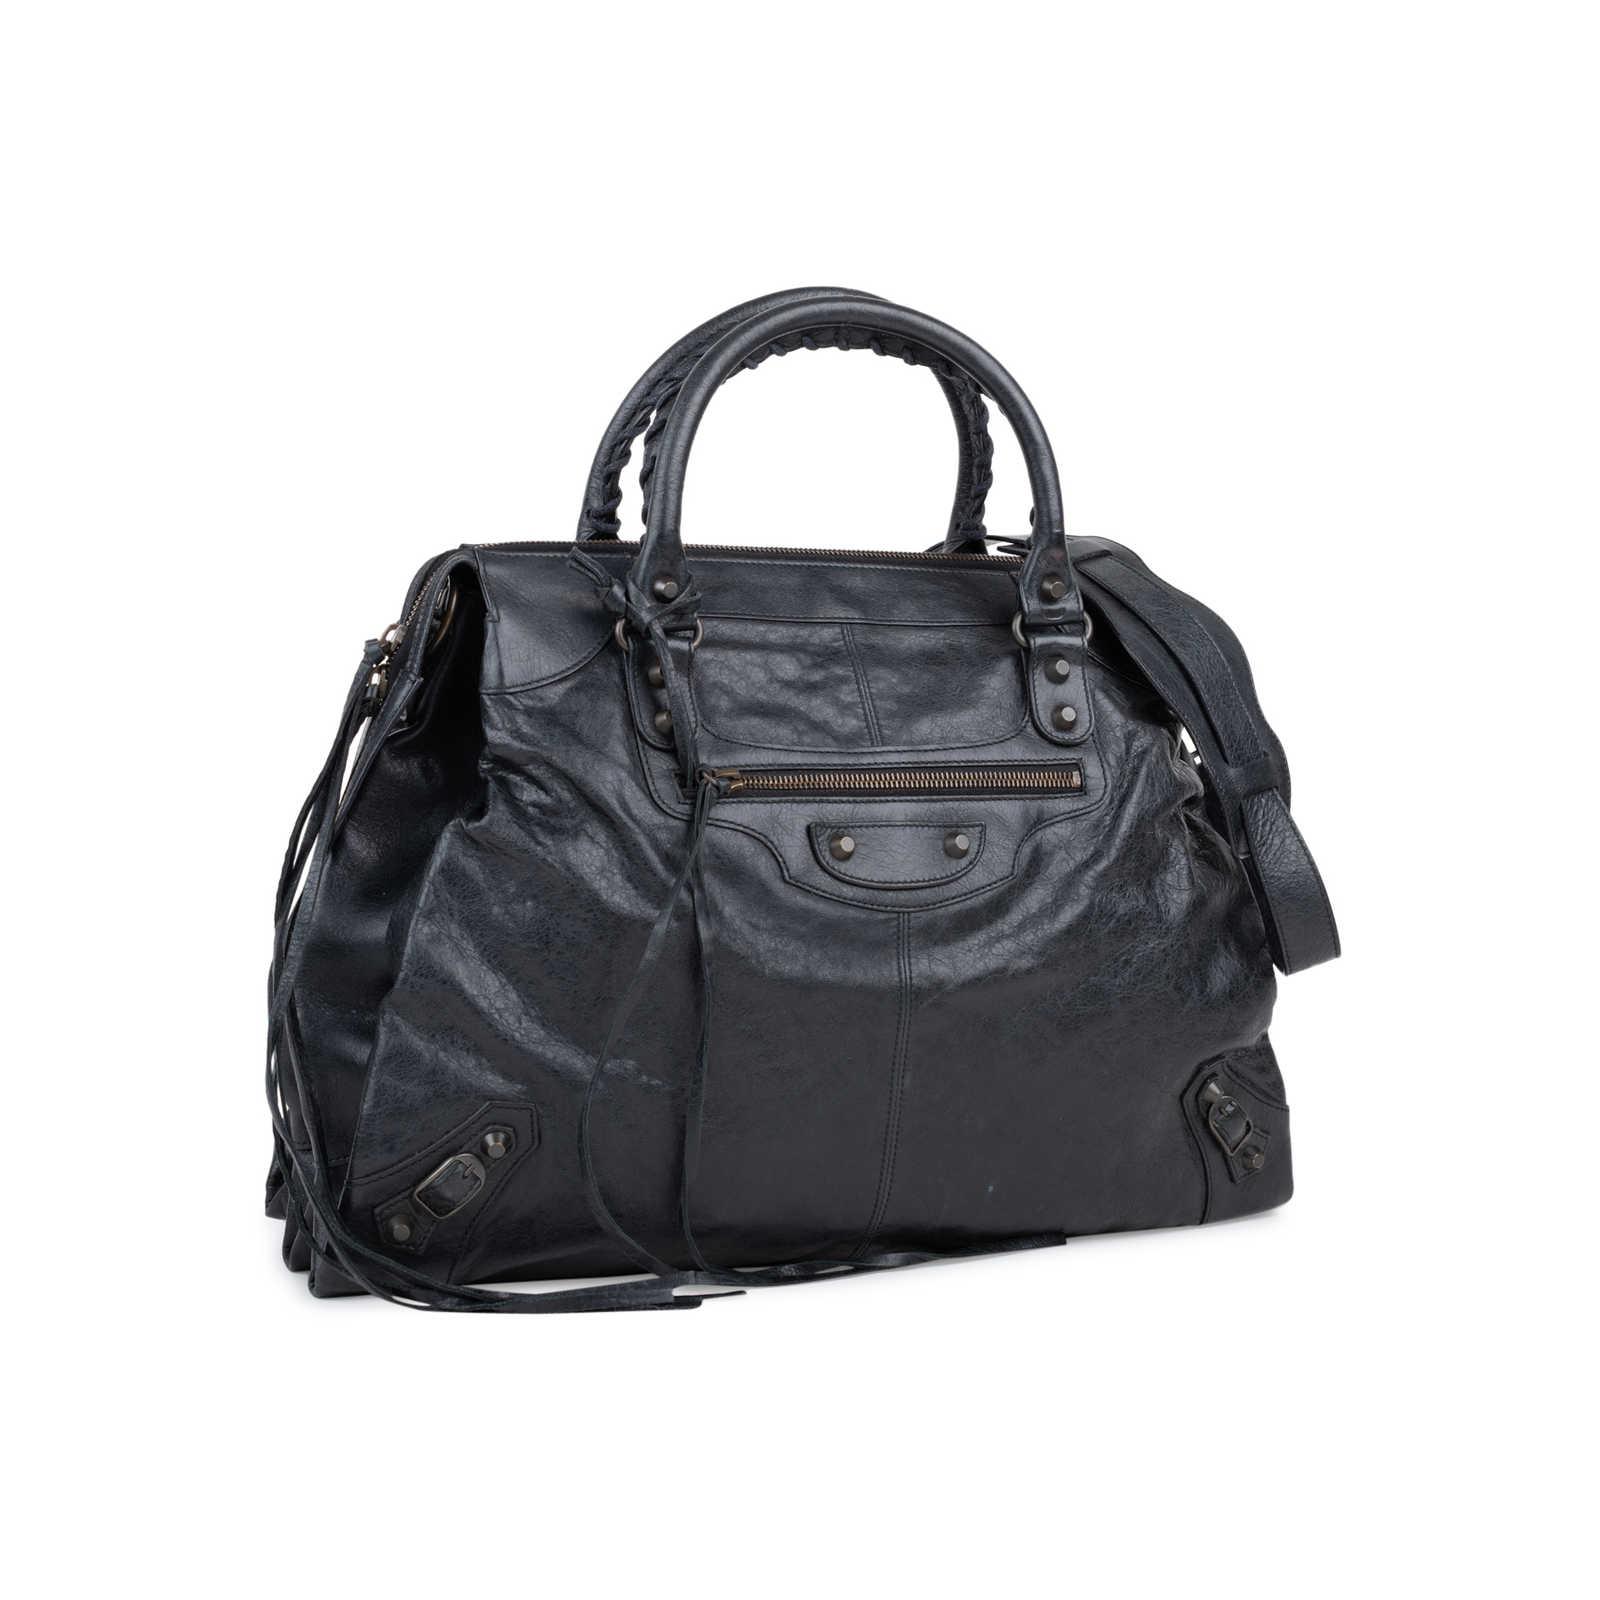 849bc48253 ... Authentic Second Hand Balenciaga Trapeze Bag (PSS-550-00001) -  Thumbnail 1 ...